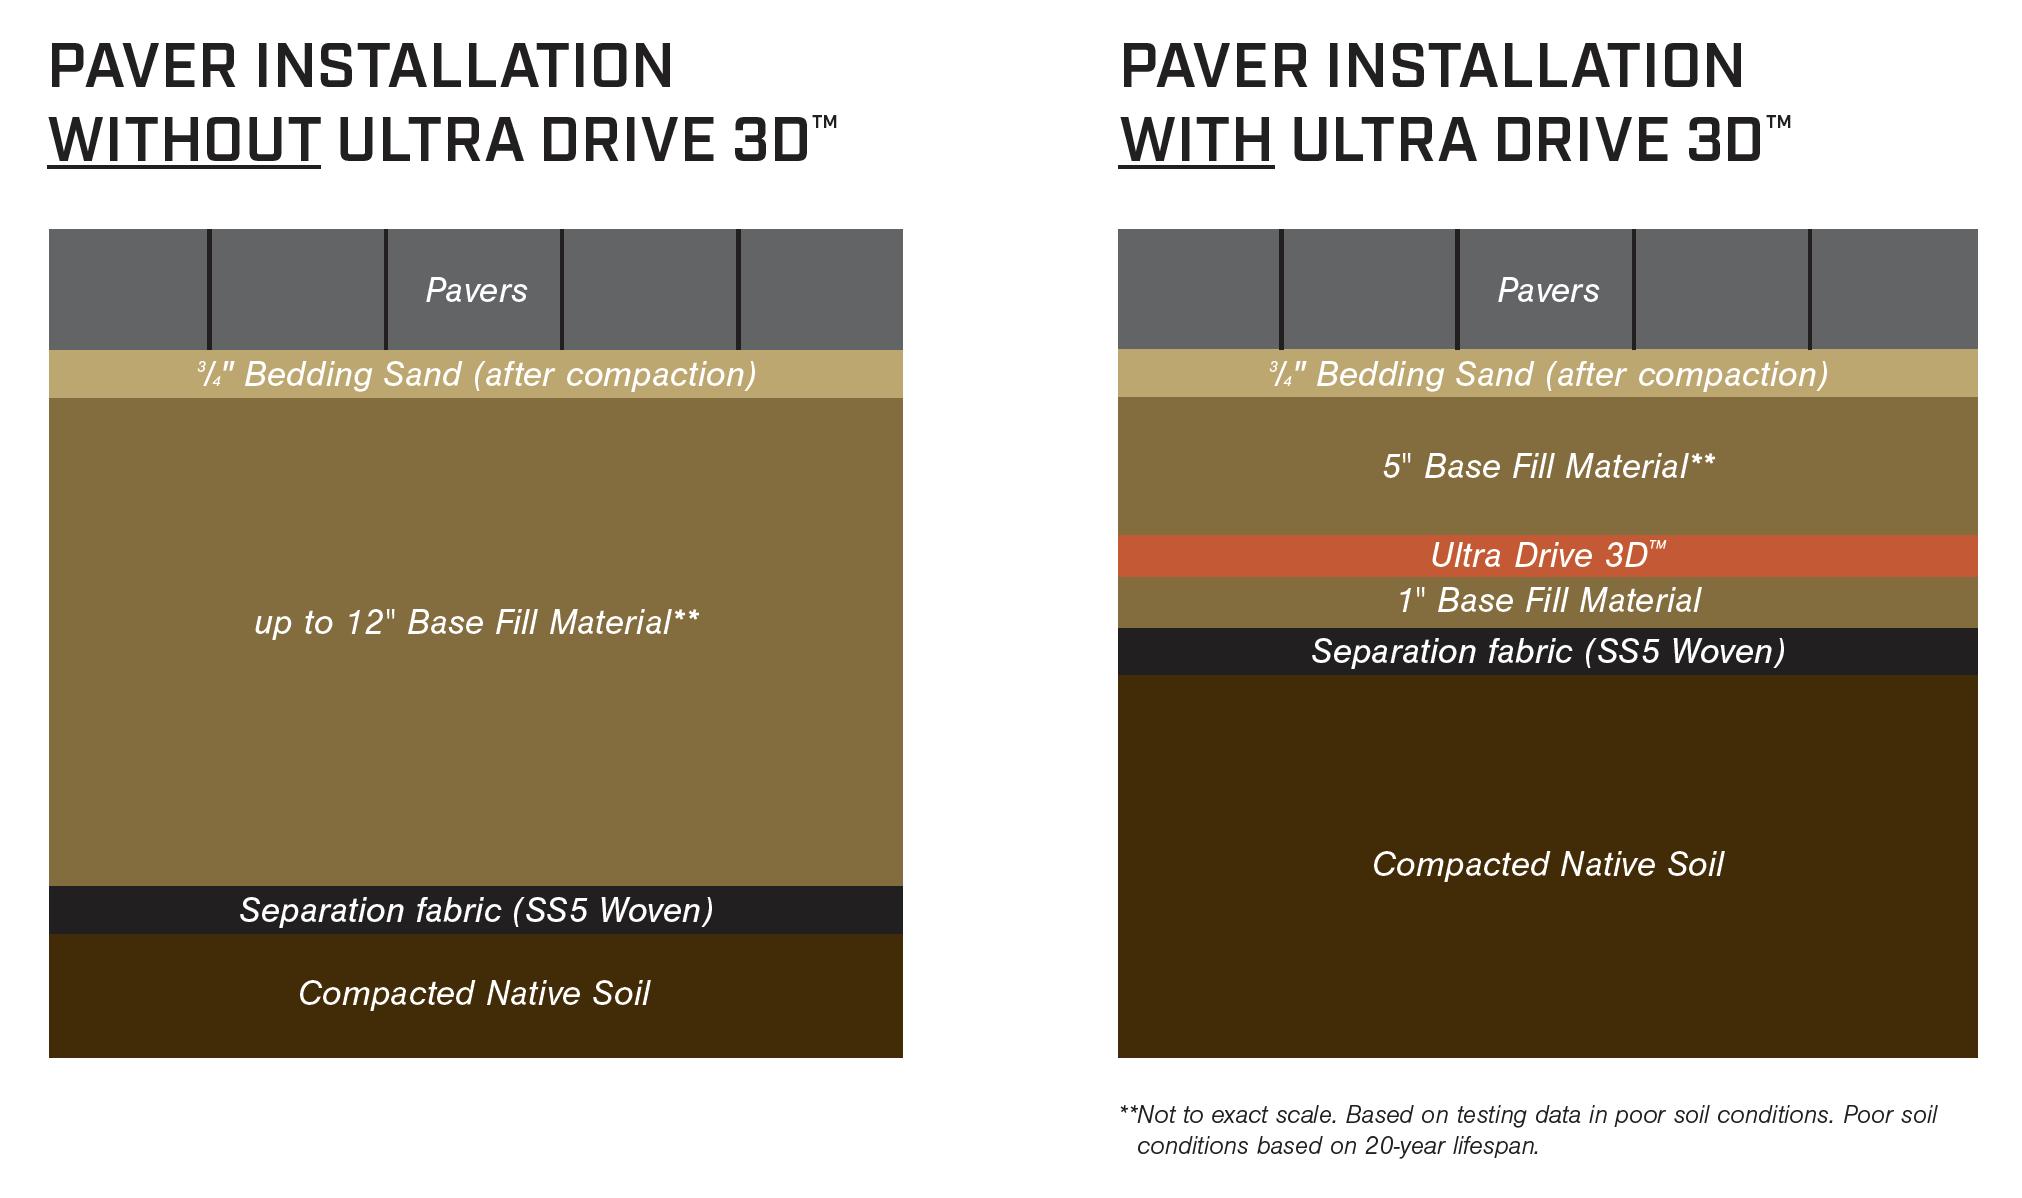 UltraDrive3D-Comparison